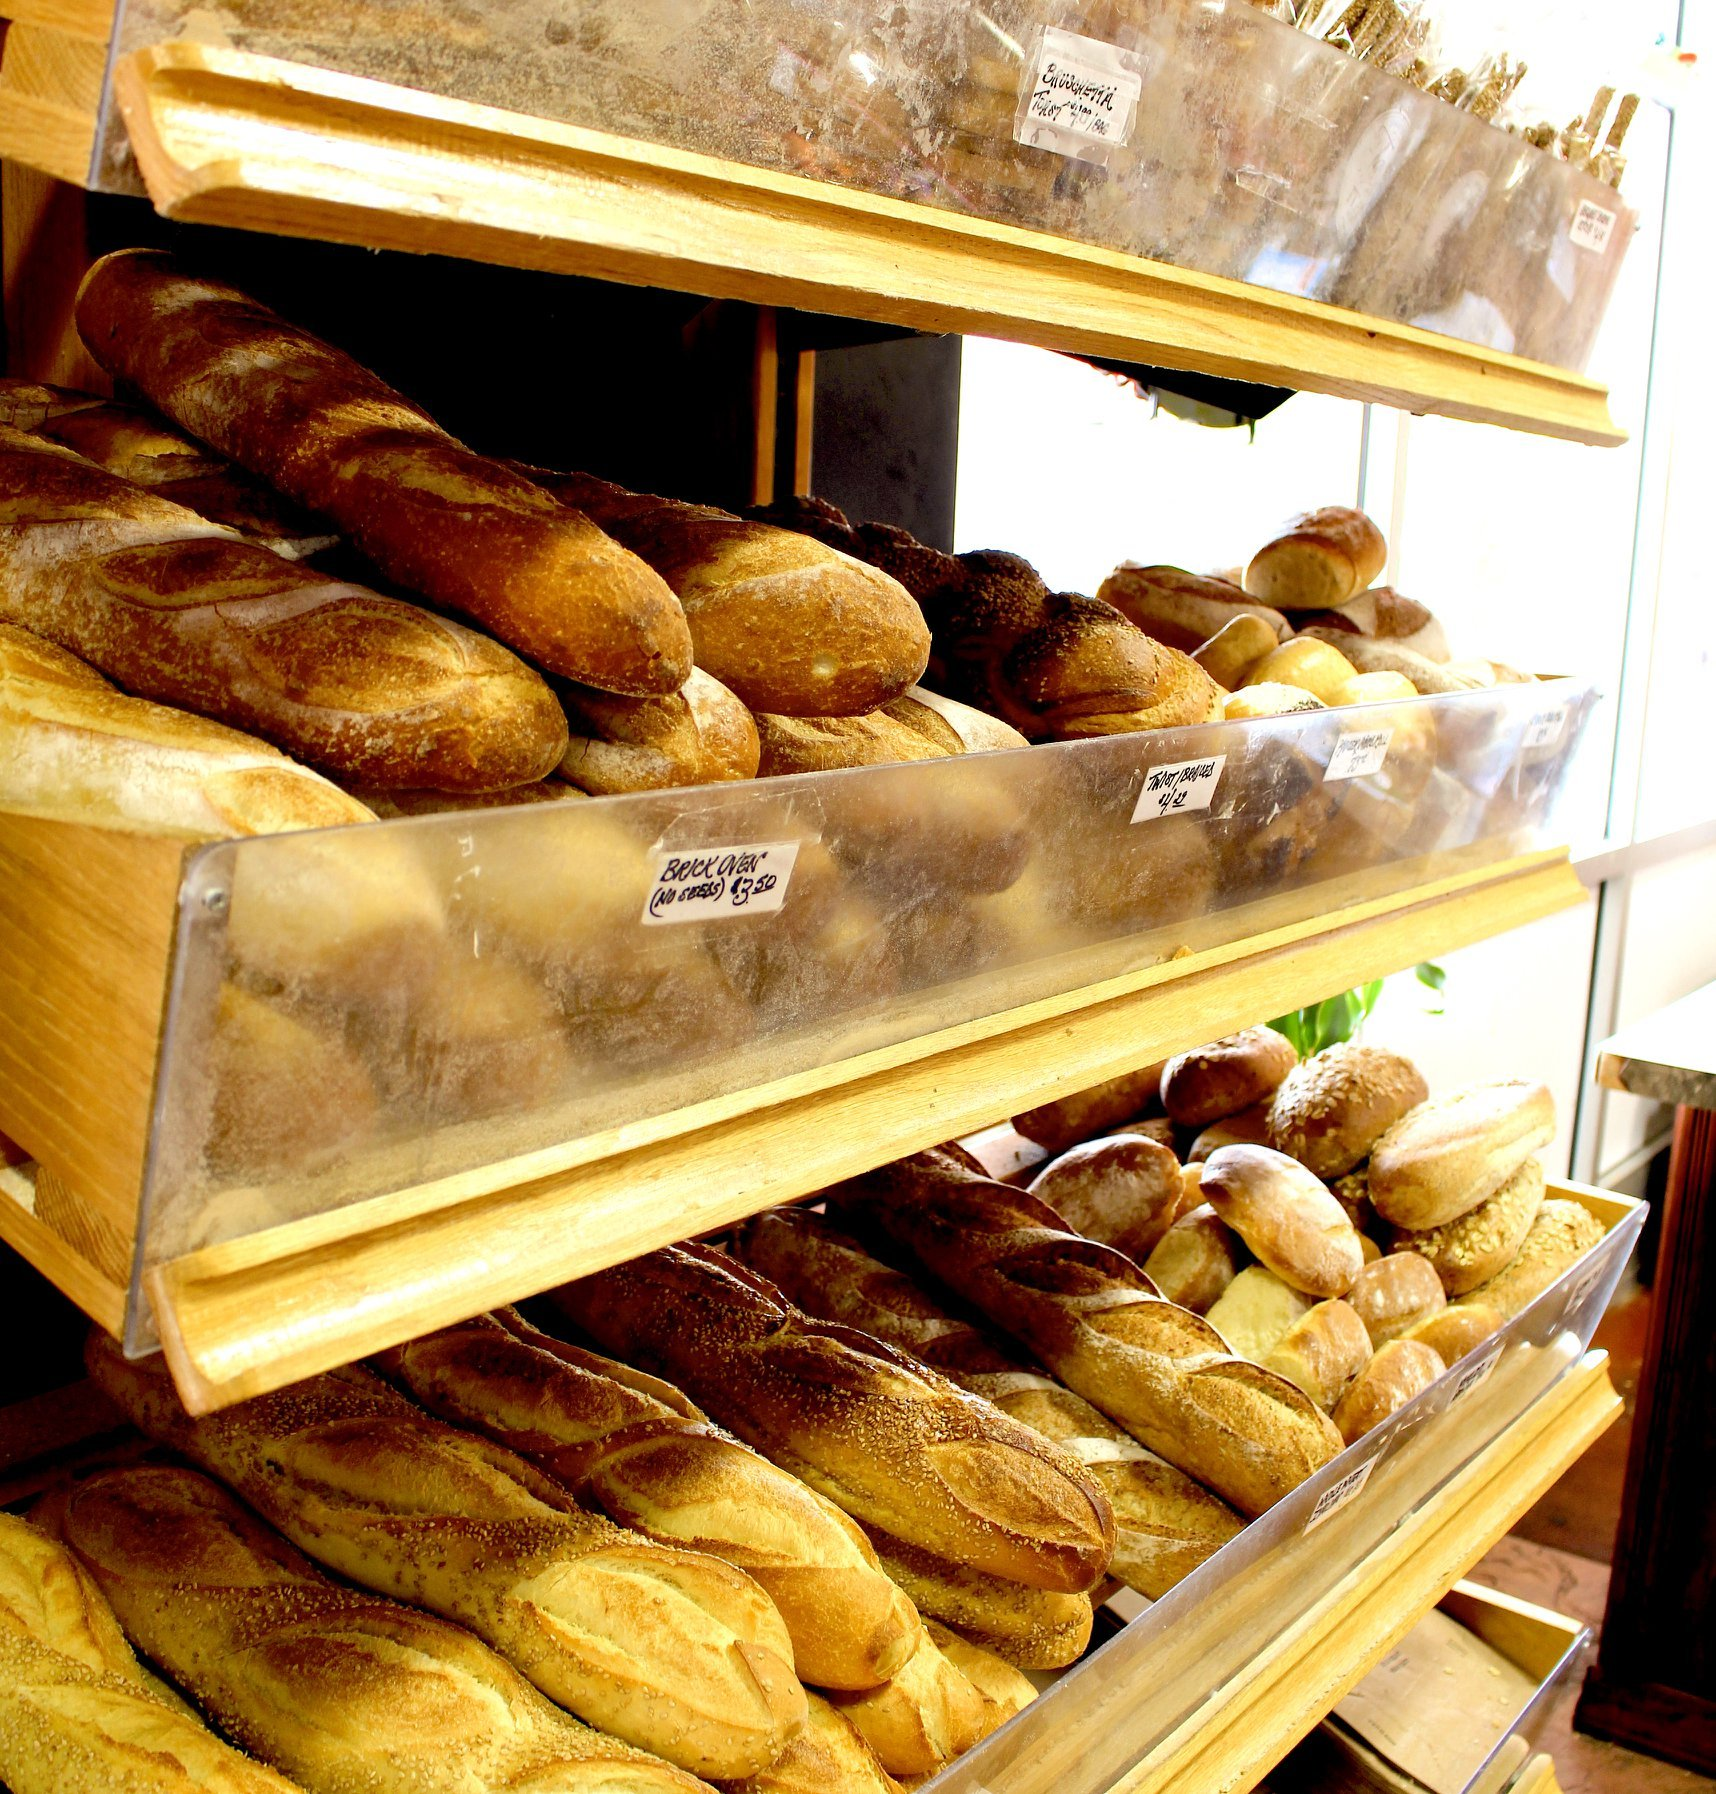 Italian Food Near Me: Tinton Falls, New Jersey